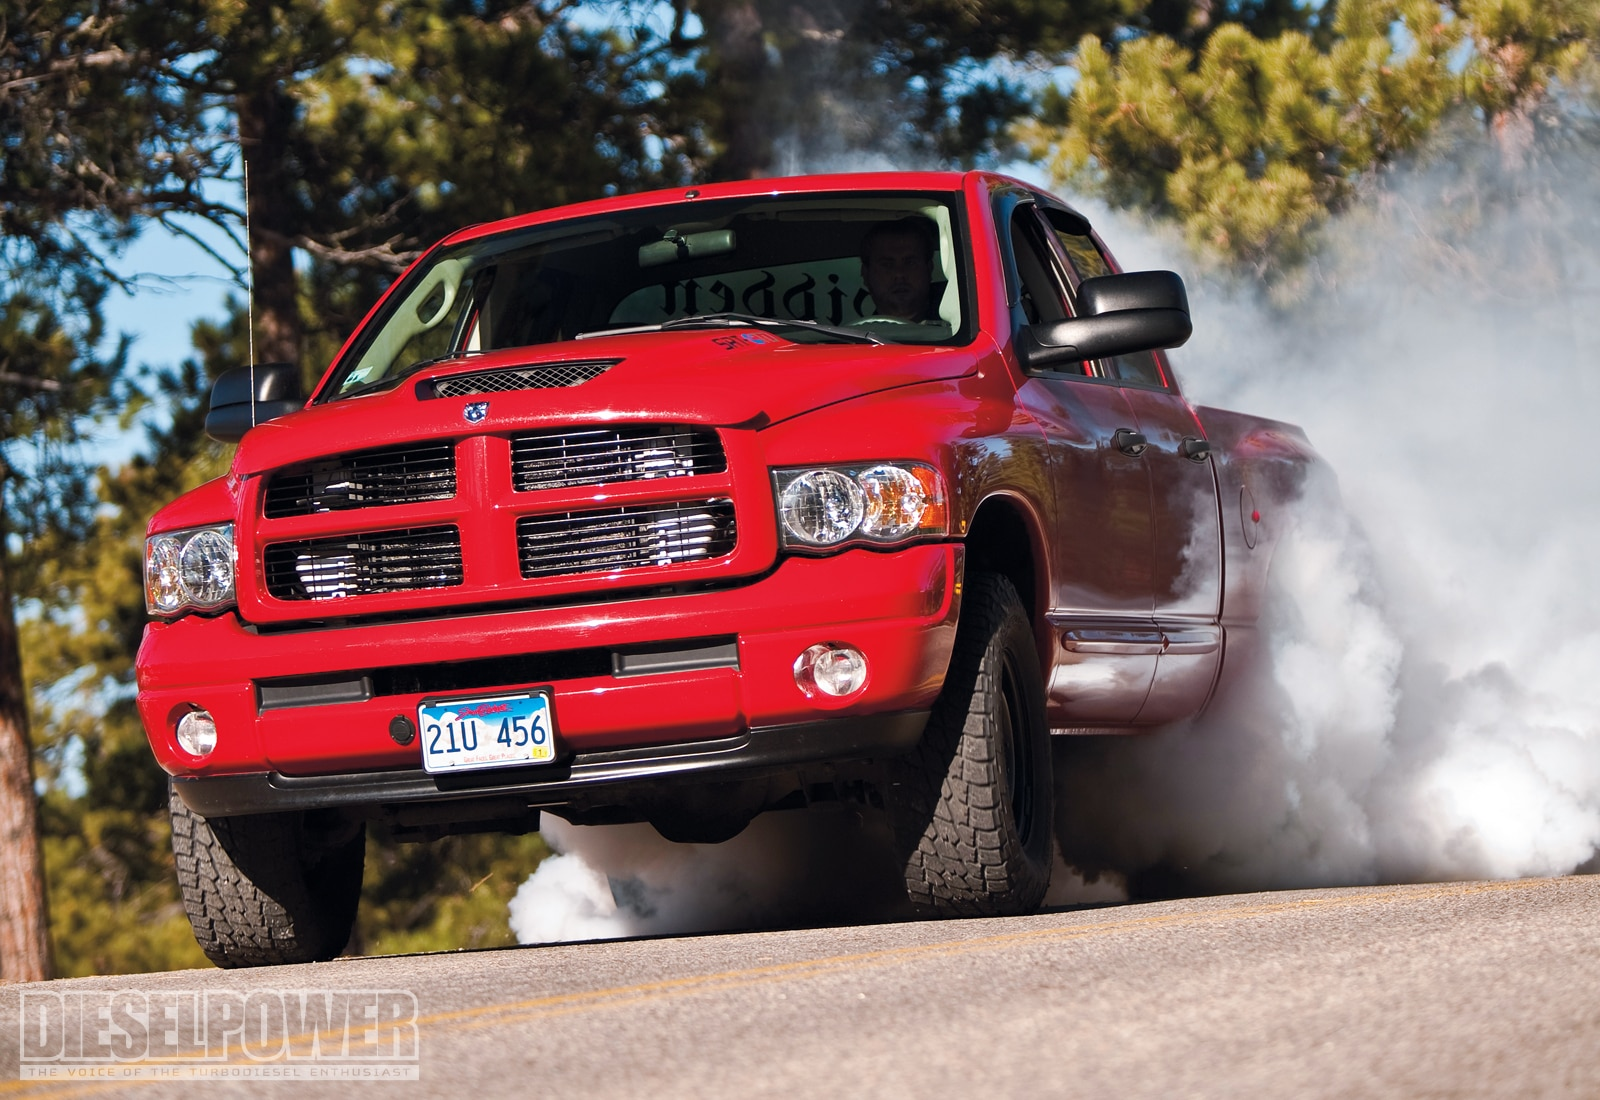 Hail Fire Brimstone 2004 Dodge Ram Photo Image Gallery